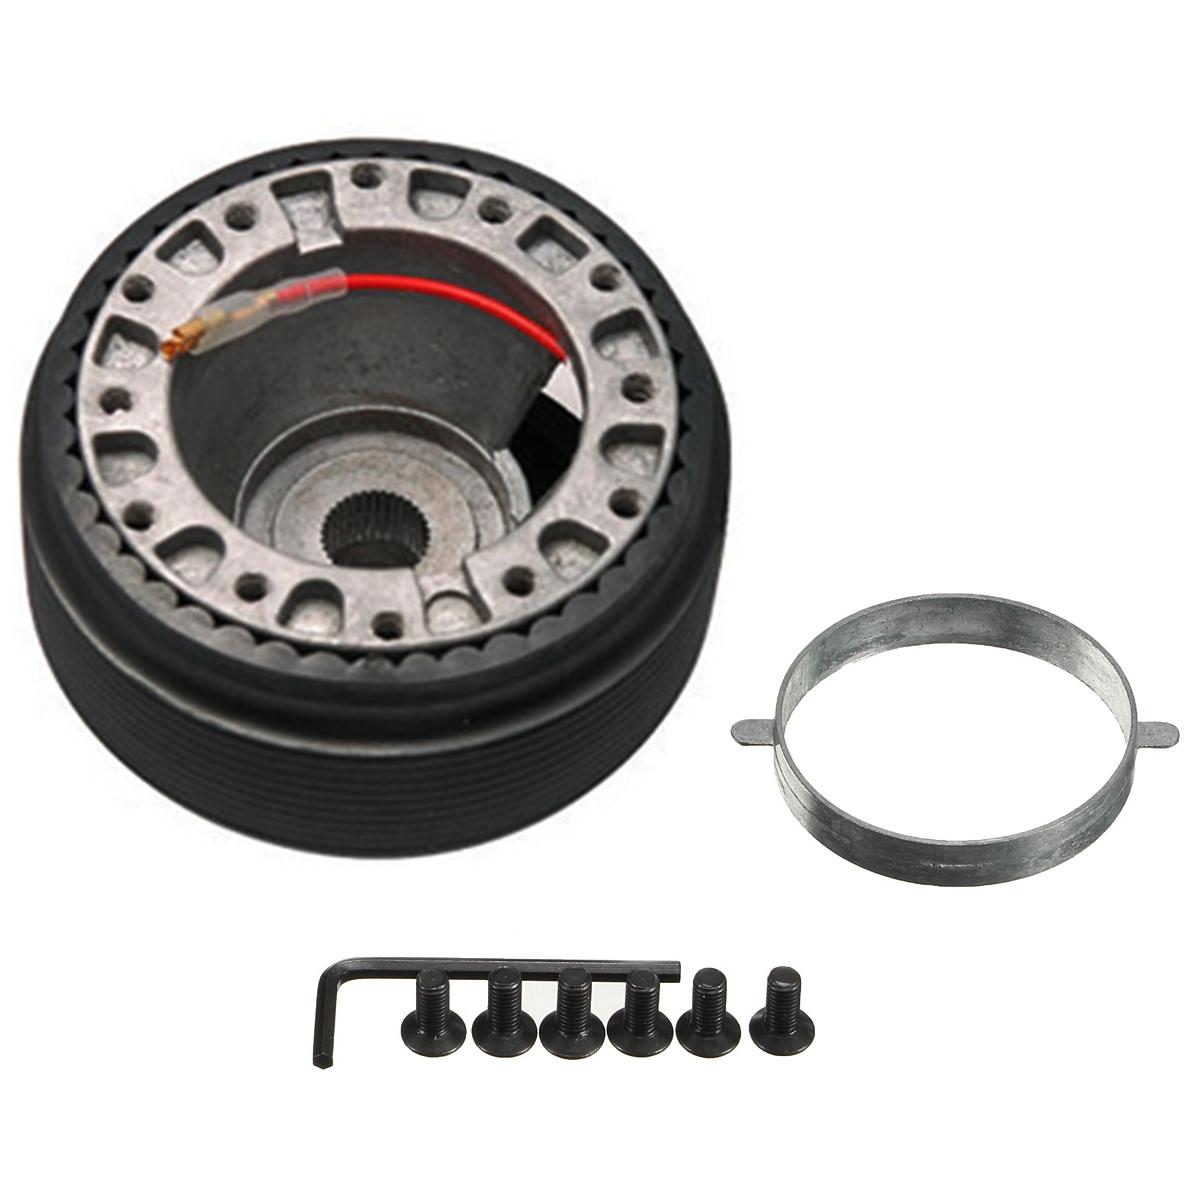 Steel Ring Wheel Racing Hub Adapter N-7 Boss Kit For NI